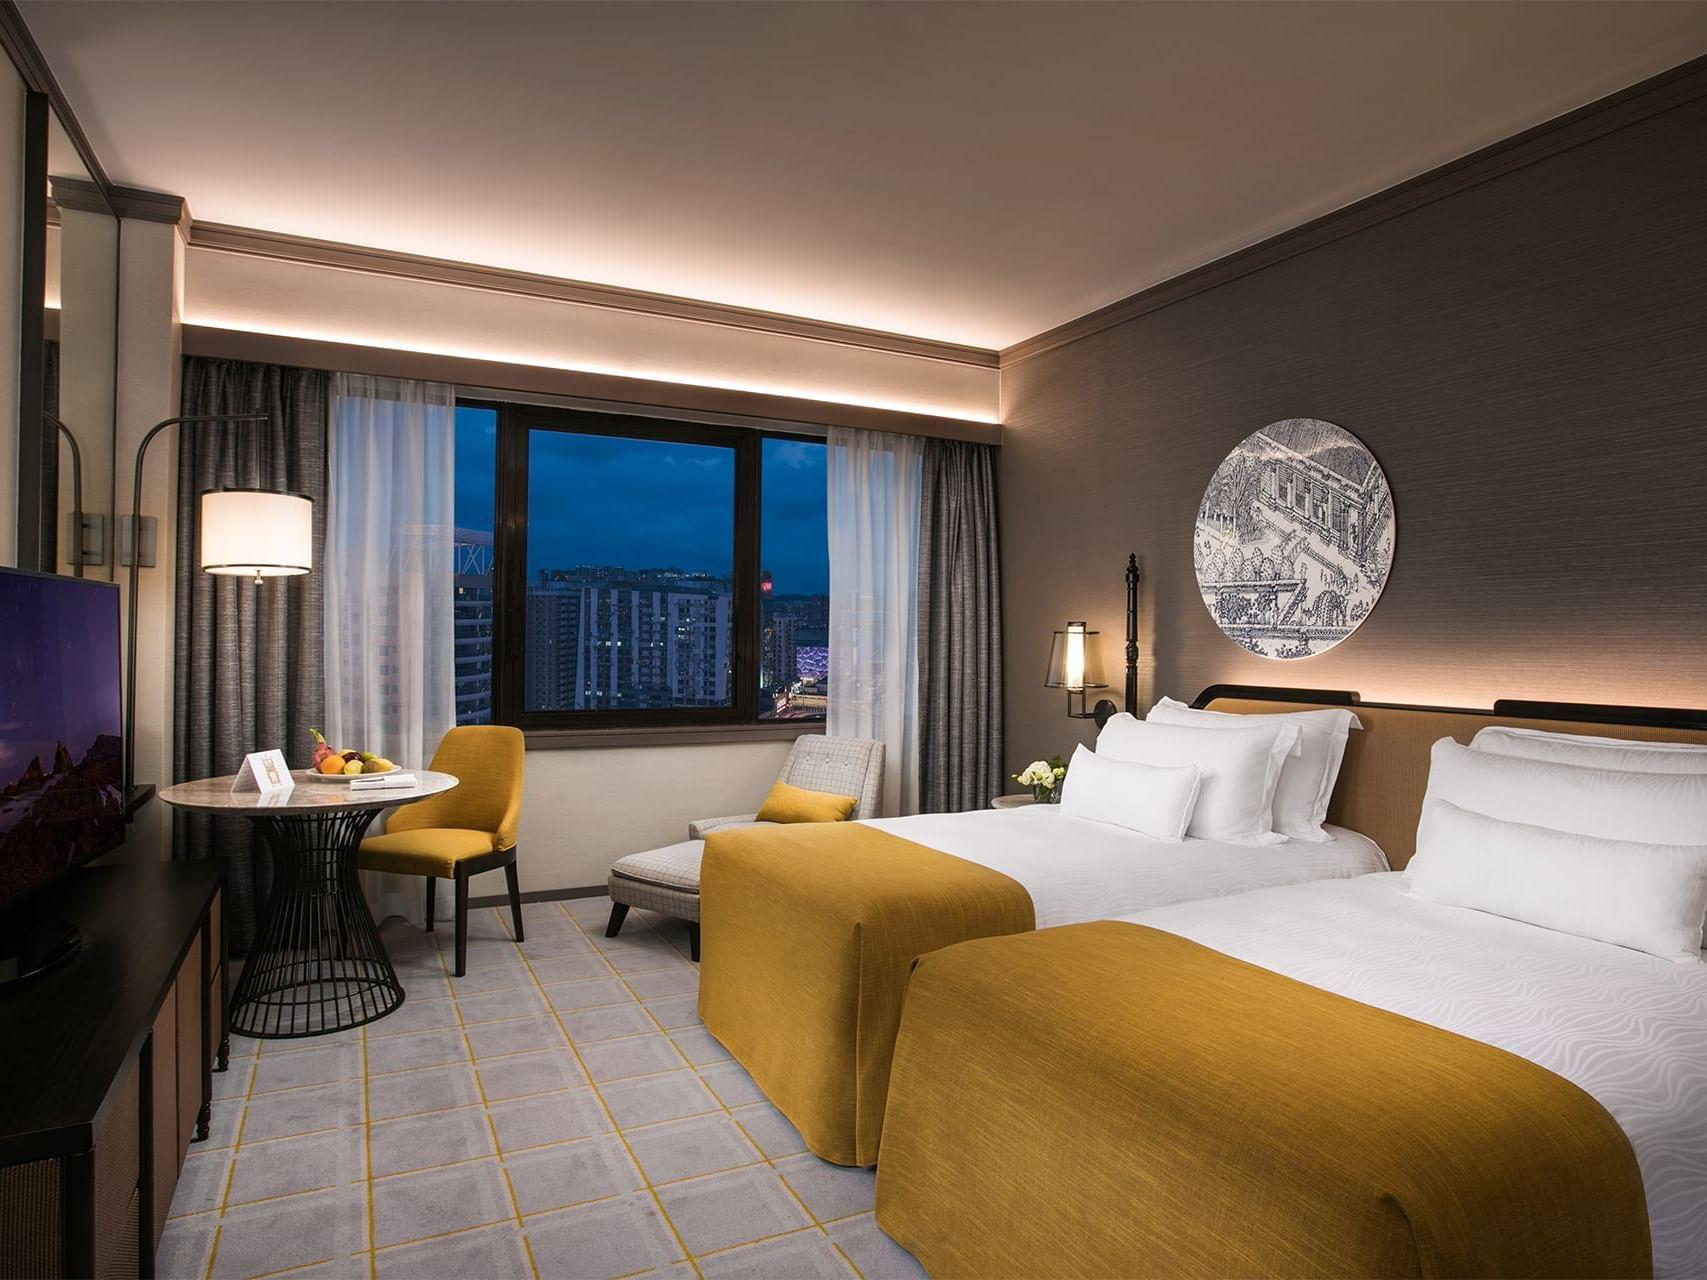 Grand Twin room at Artyzen Grand Lapa Hotel Macau